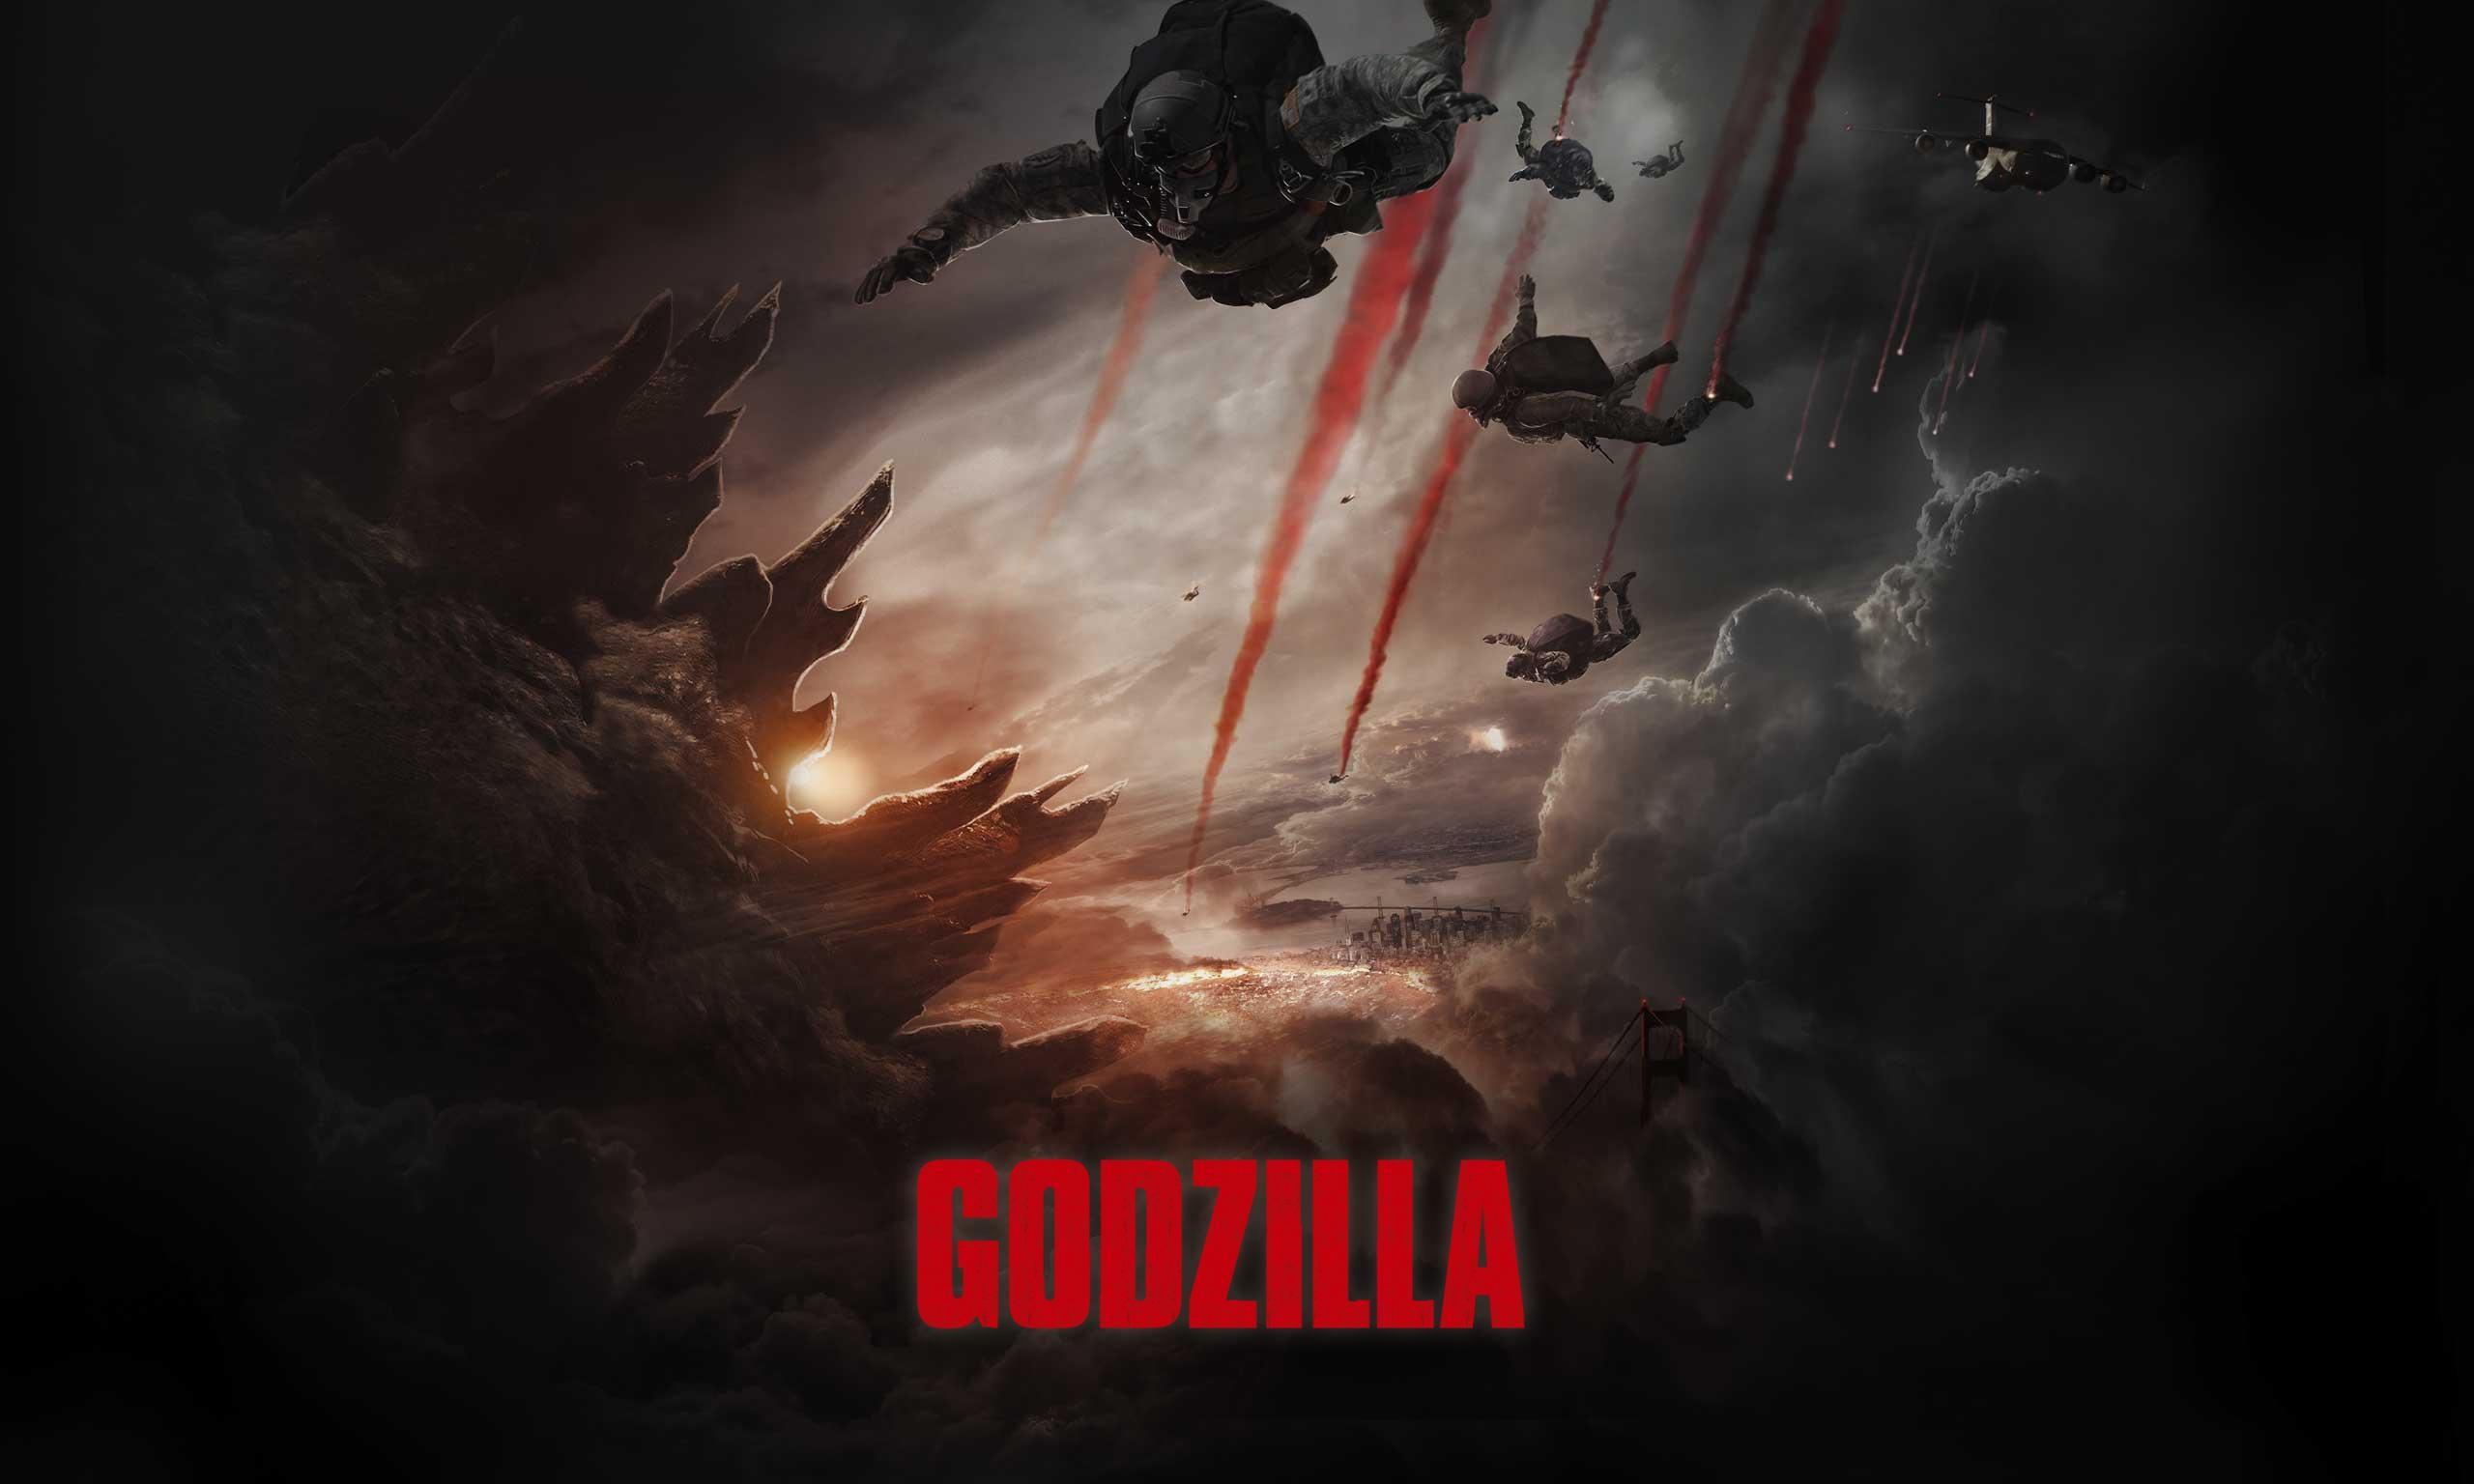 Godzilla 2014 Movie Wallpaper HD   Godzilla 2014 Movie